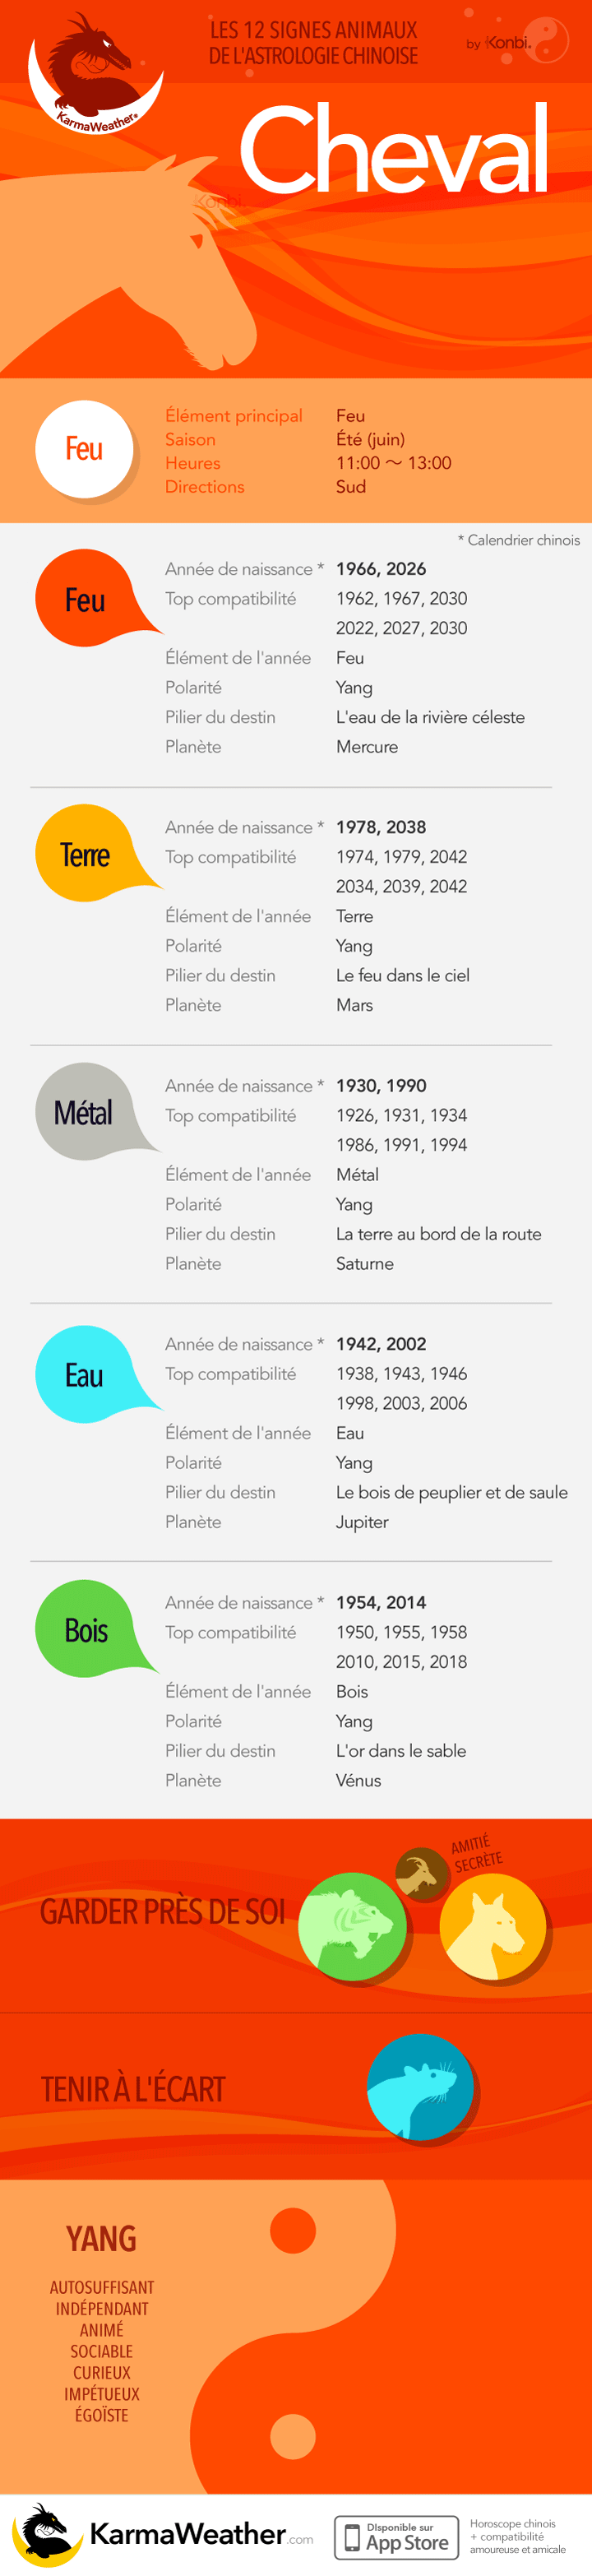 CALENDRIER 2006 ANN%C3%83E   https://kalendrier.ouest france.fr